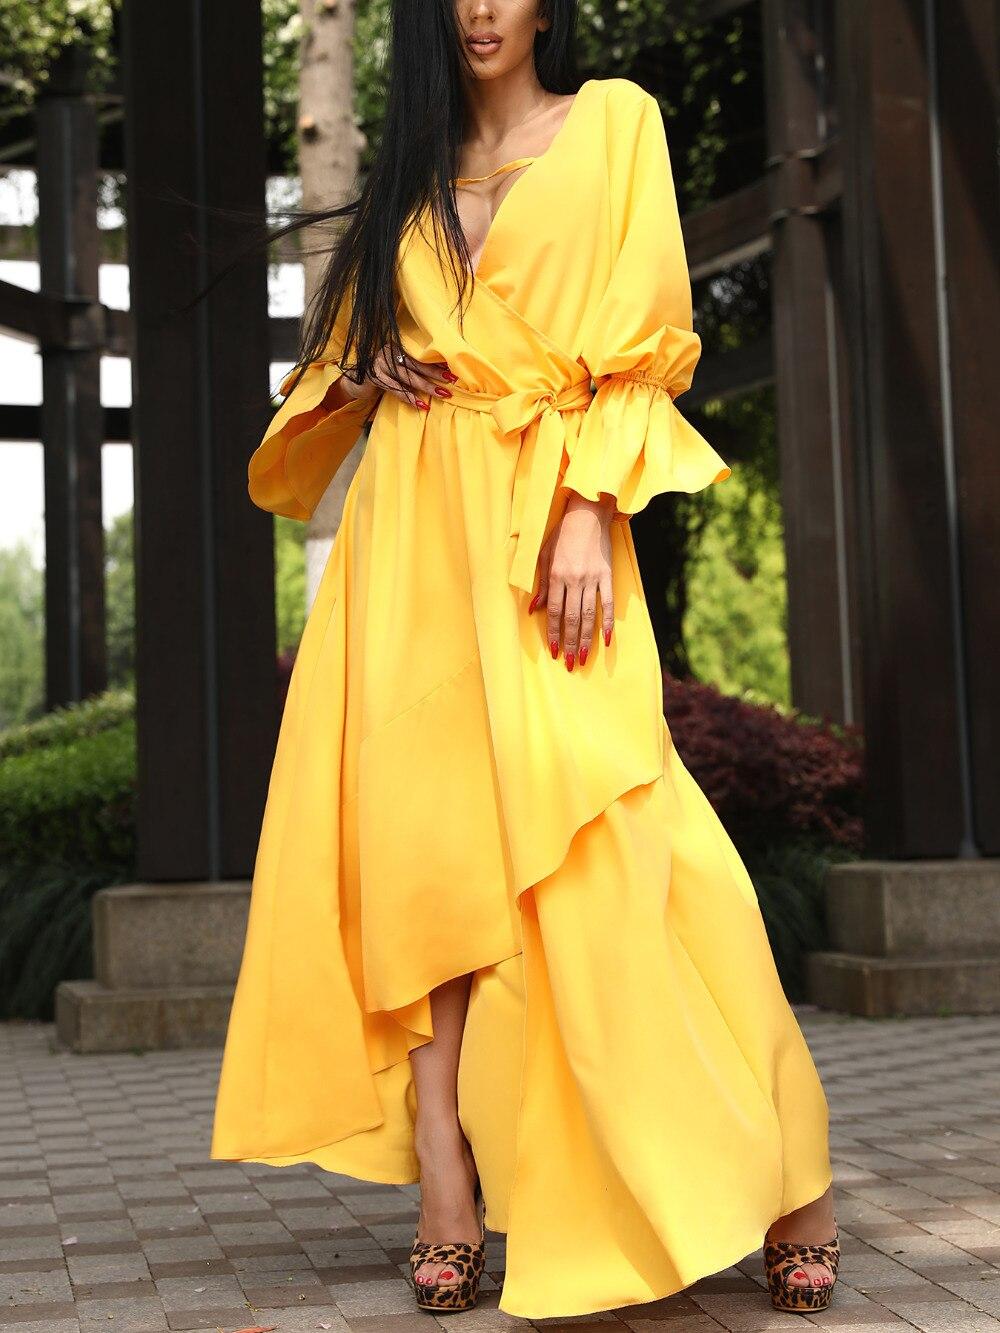 Summer Fashion Solid Color V-Neck Yellow Women Dresses Asymetrical Ruffle Tie Waist Dip Hem Wrap Dress